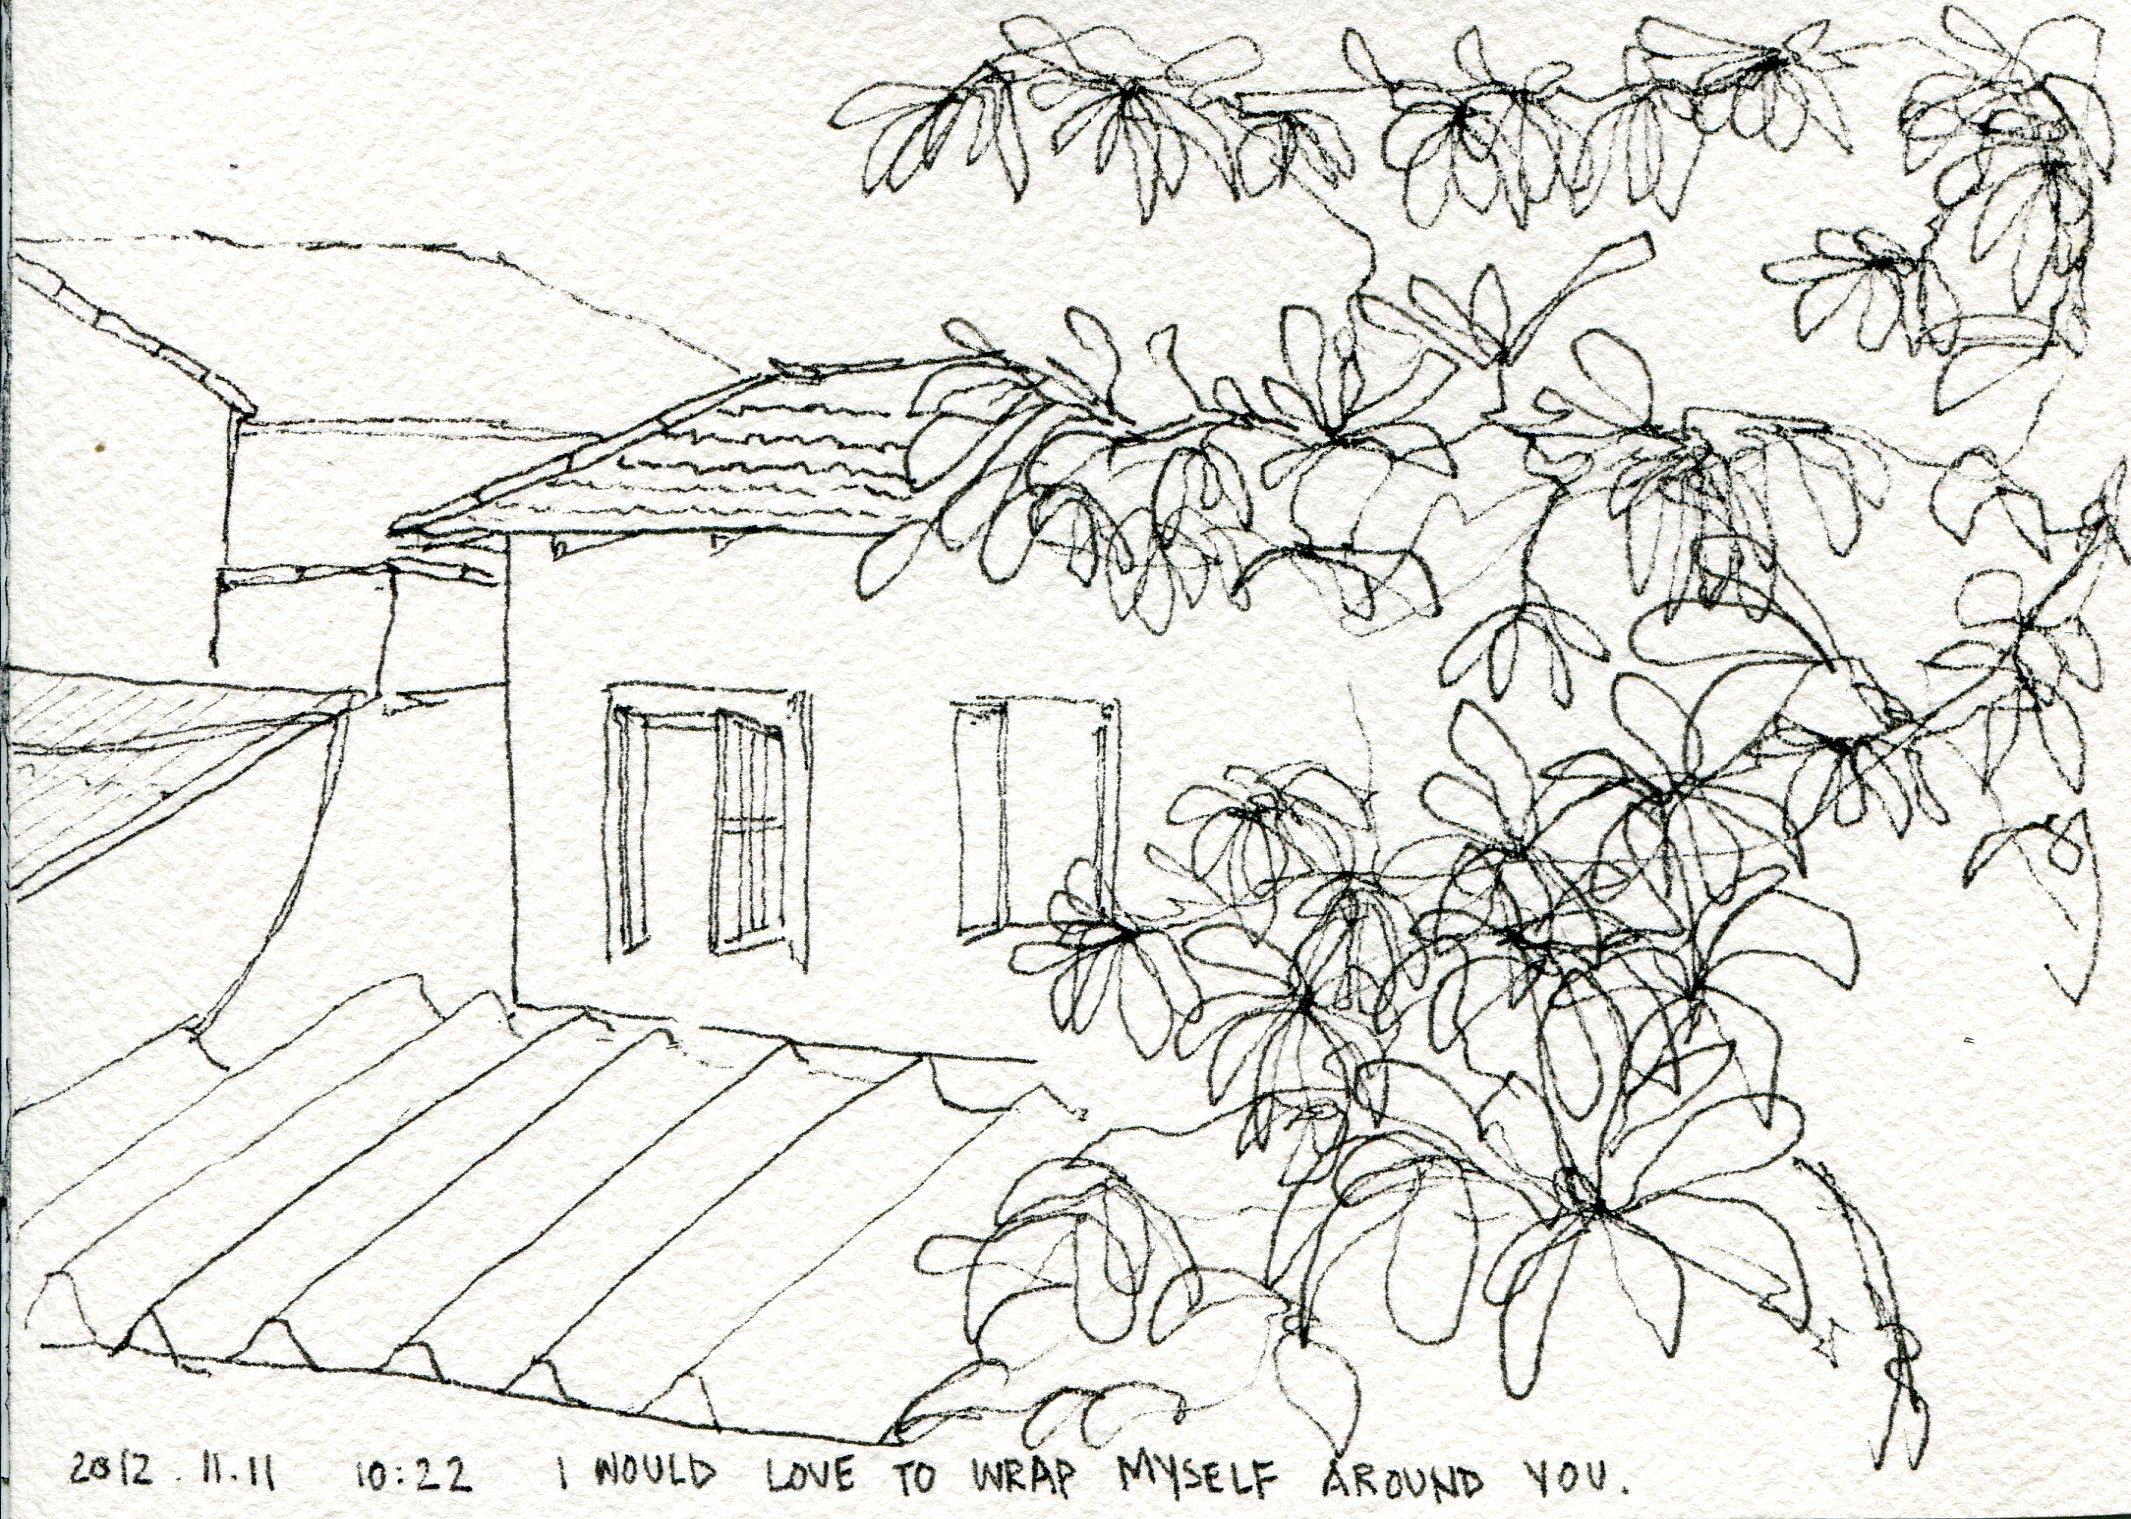 2012-11-18 drawing011.jpg